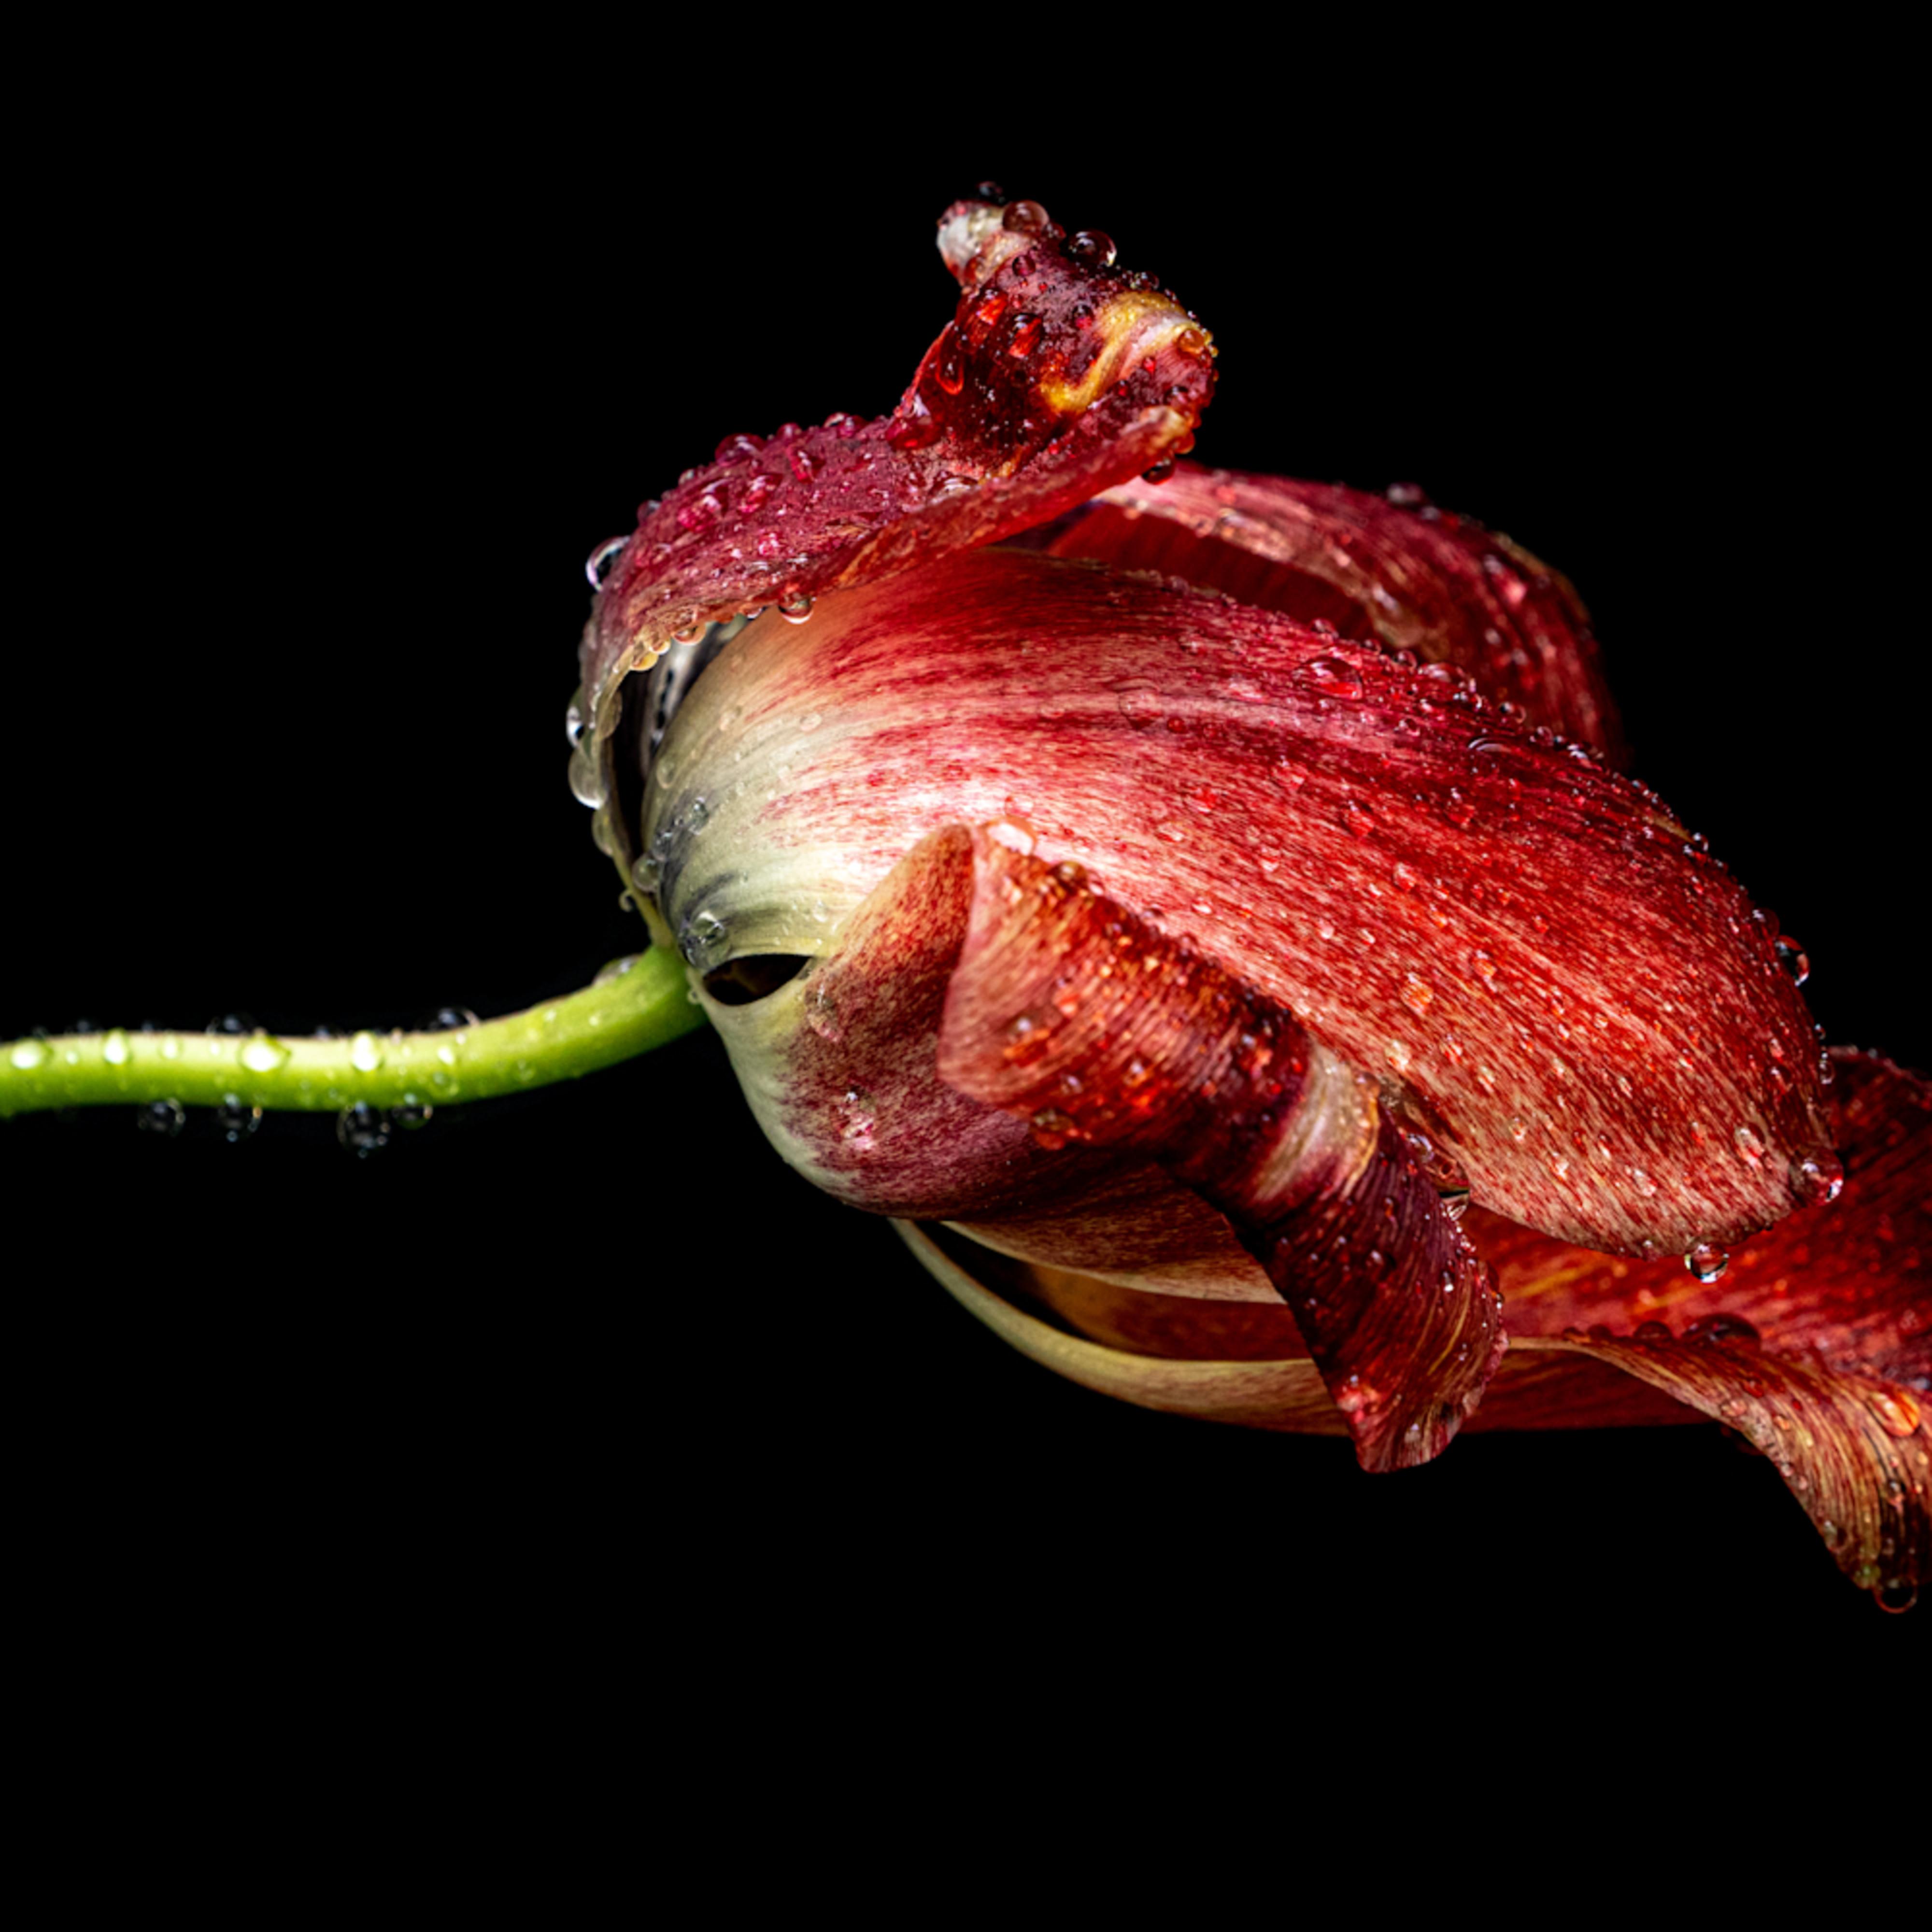 Twp flowers 20200525 0001 dtiudp